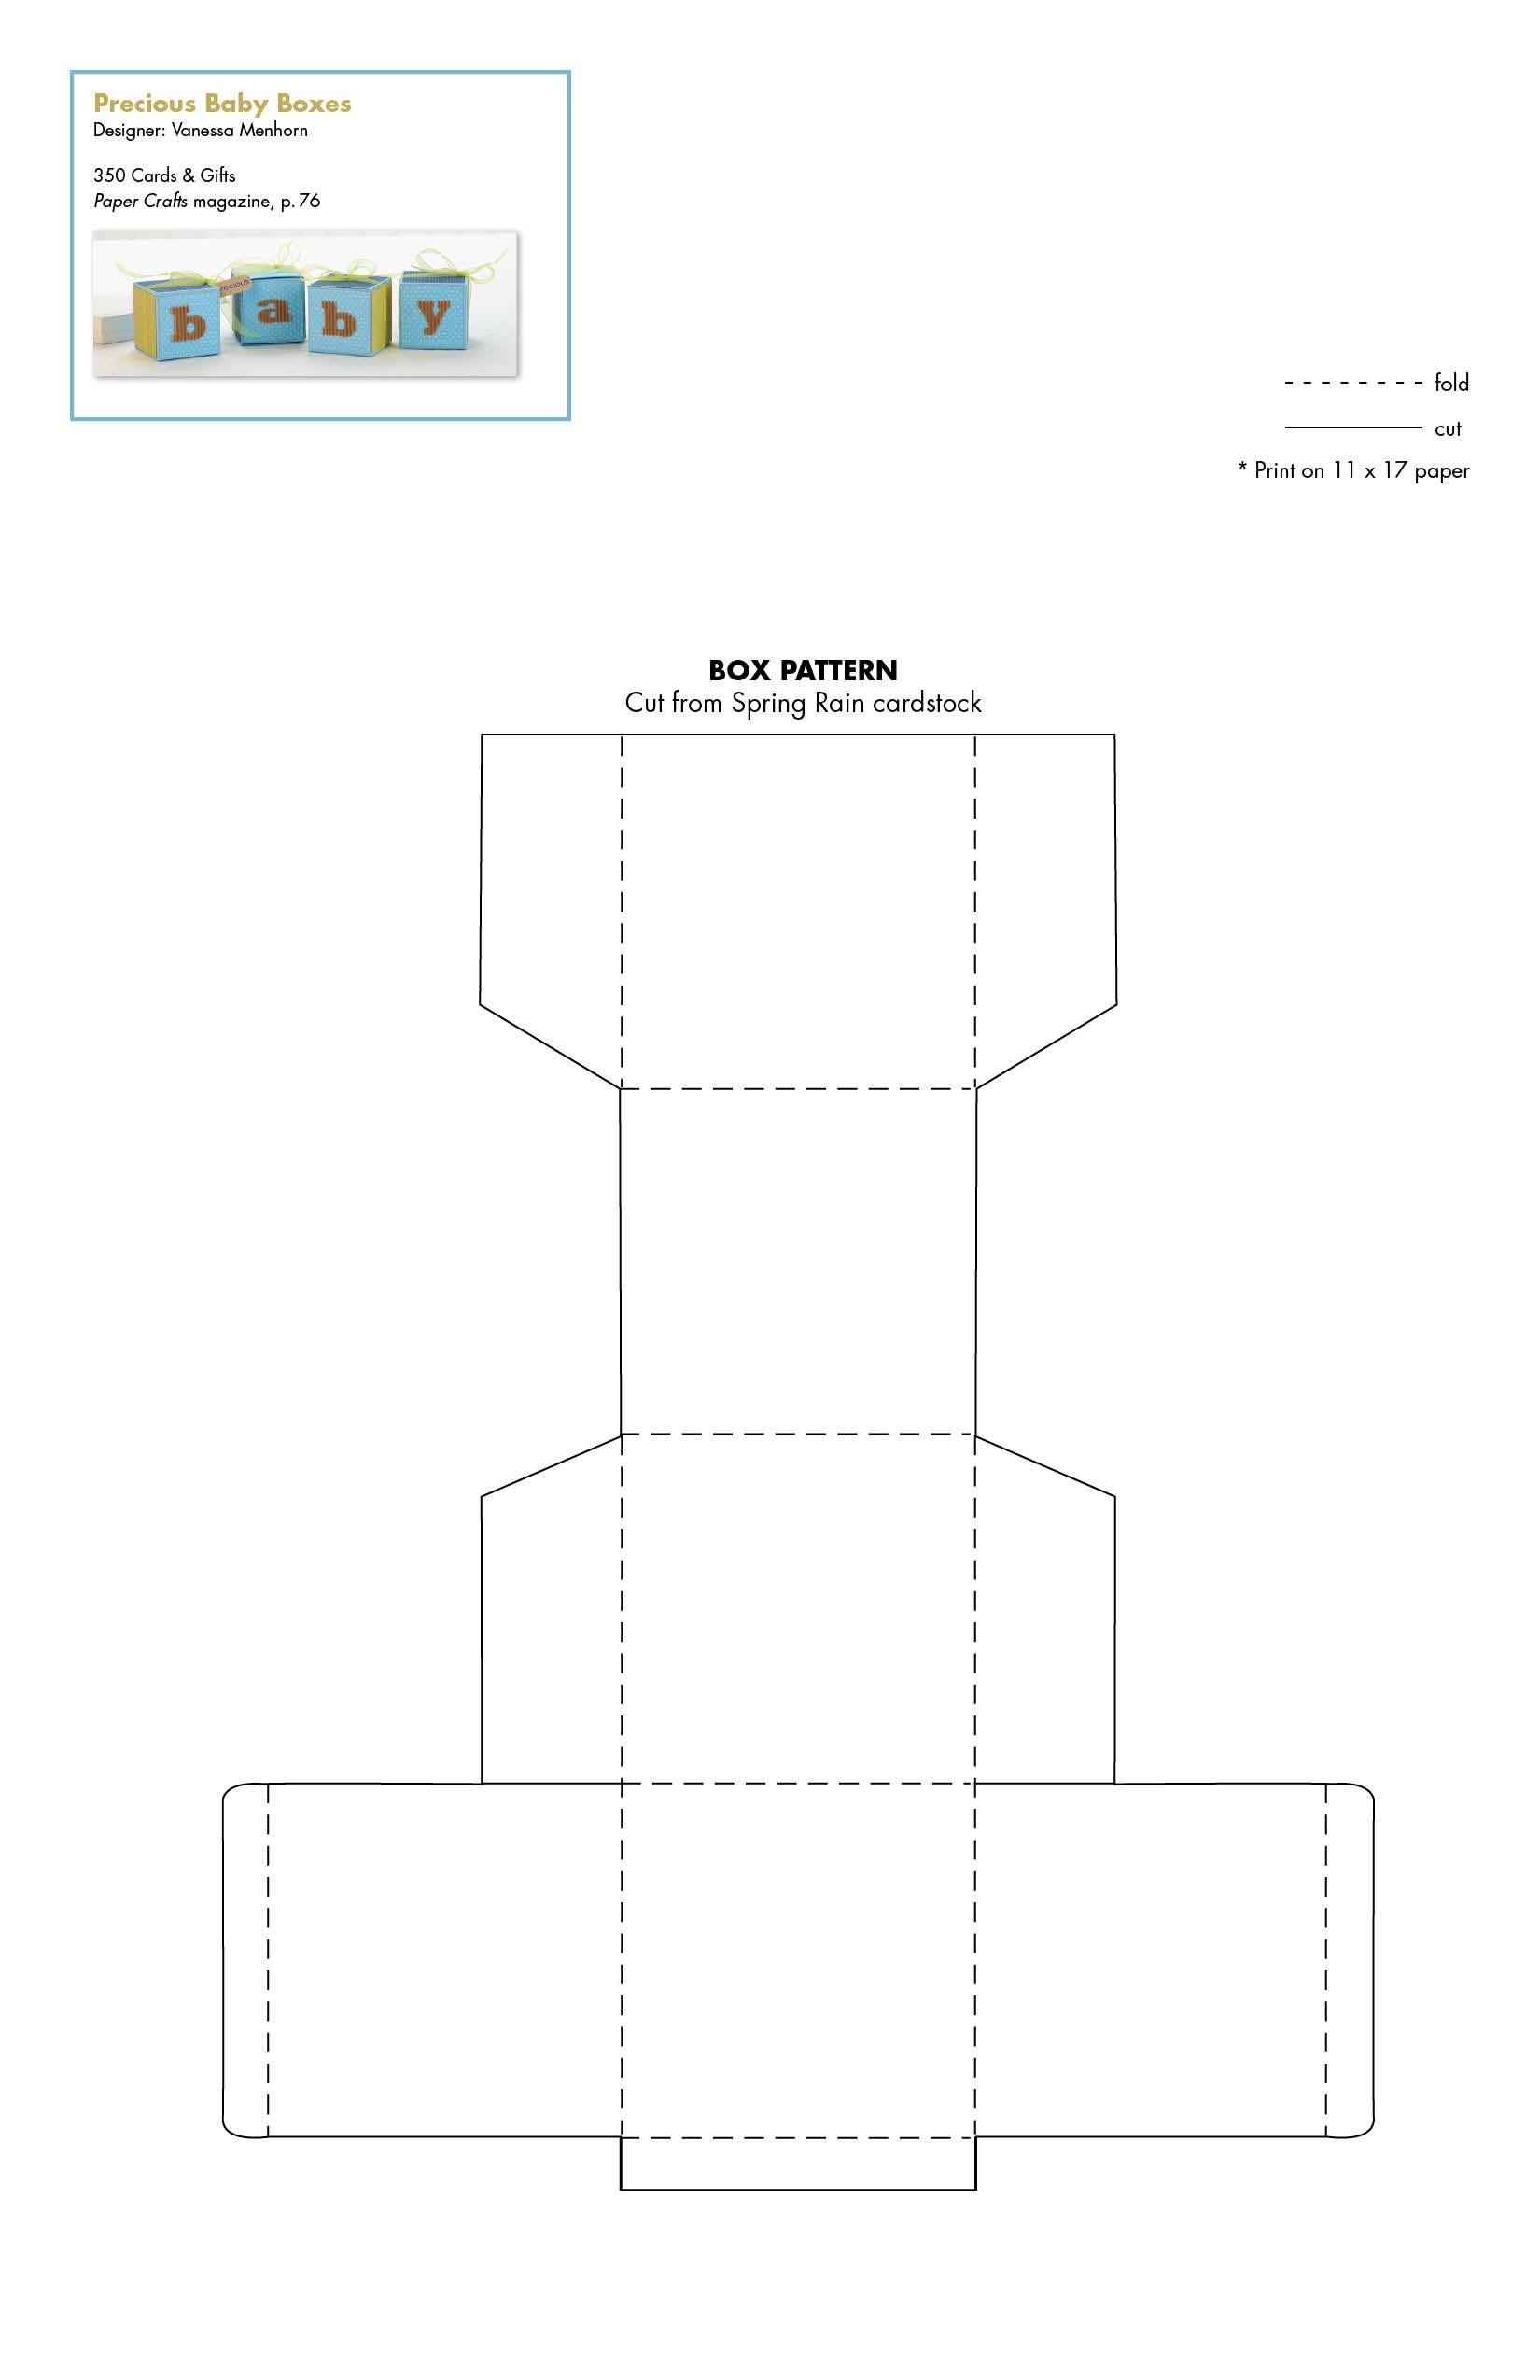 Precious_Baby_Box_Set.jpg 1.650×2.550 píxeles. Paper Crafts MagazineBaby BoxGift ...  sc 1 st  Pinterest & Precious_Baby_Box_Set.jpg 1.650×2.550 píxeles | Free templates 3D ... Aboutintivar.Com